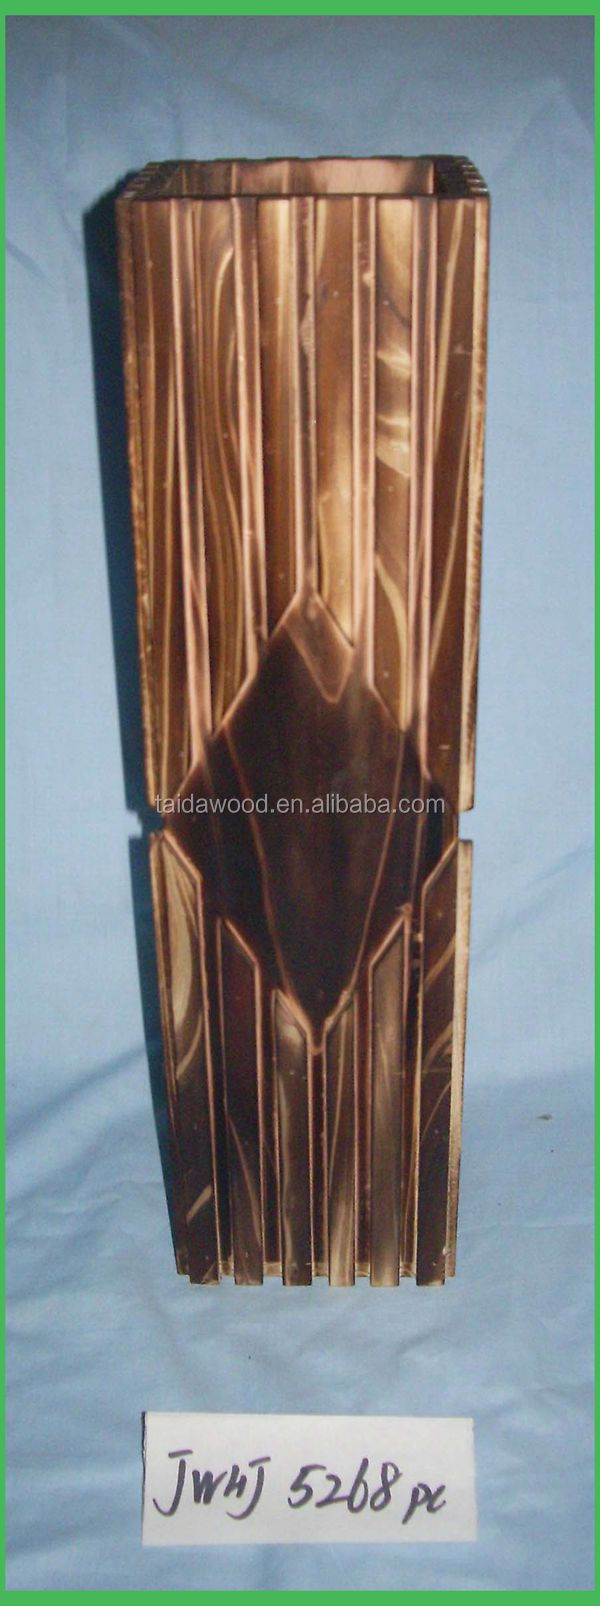 Best selling handmade natural wood vase buy hand carved